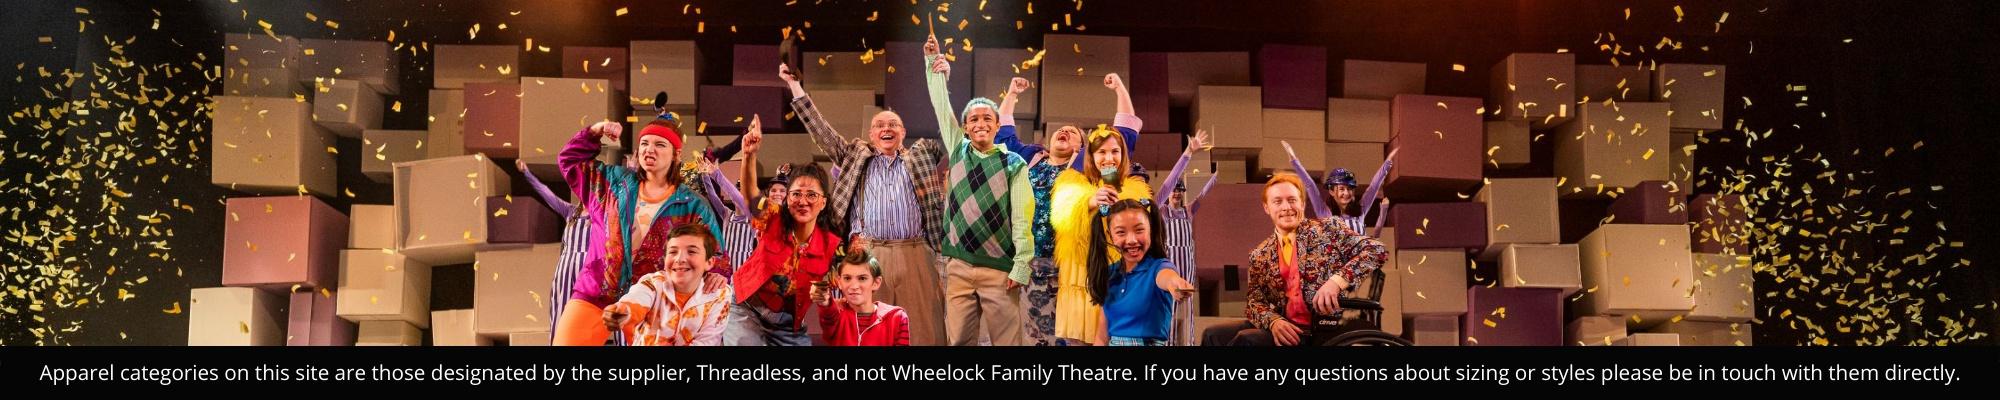 wheelockfamilytheatre Cover